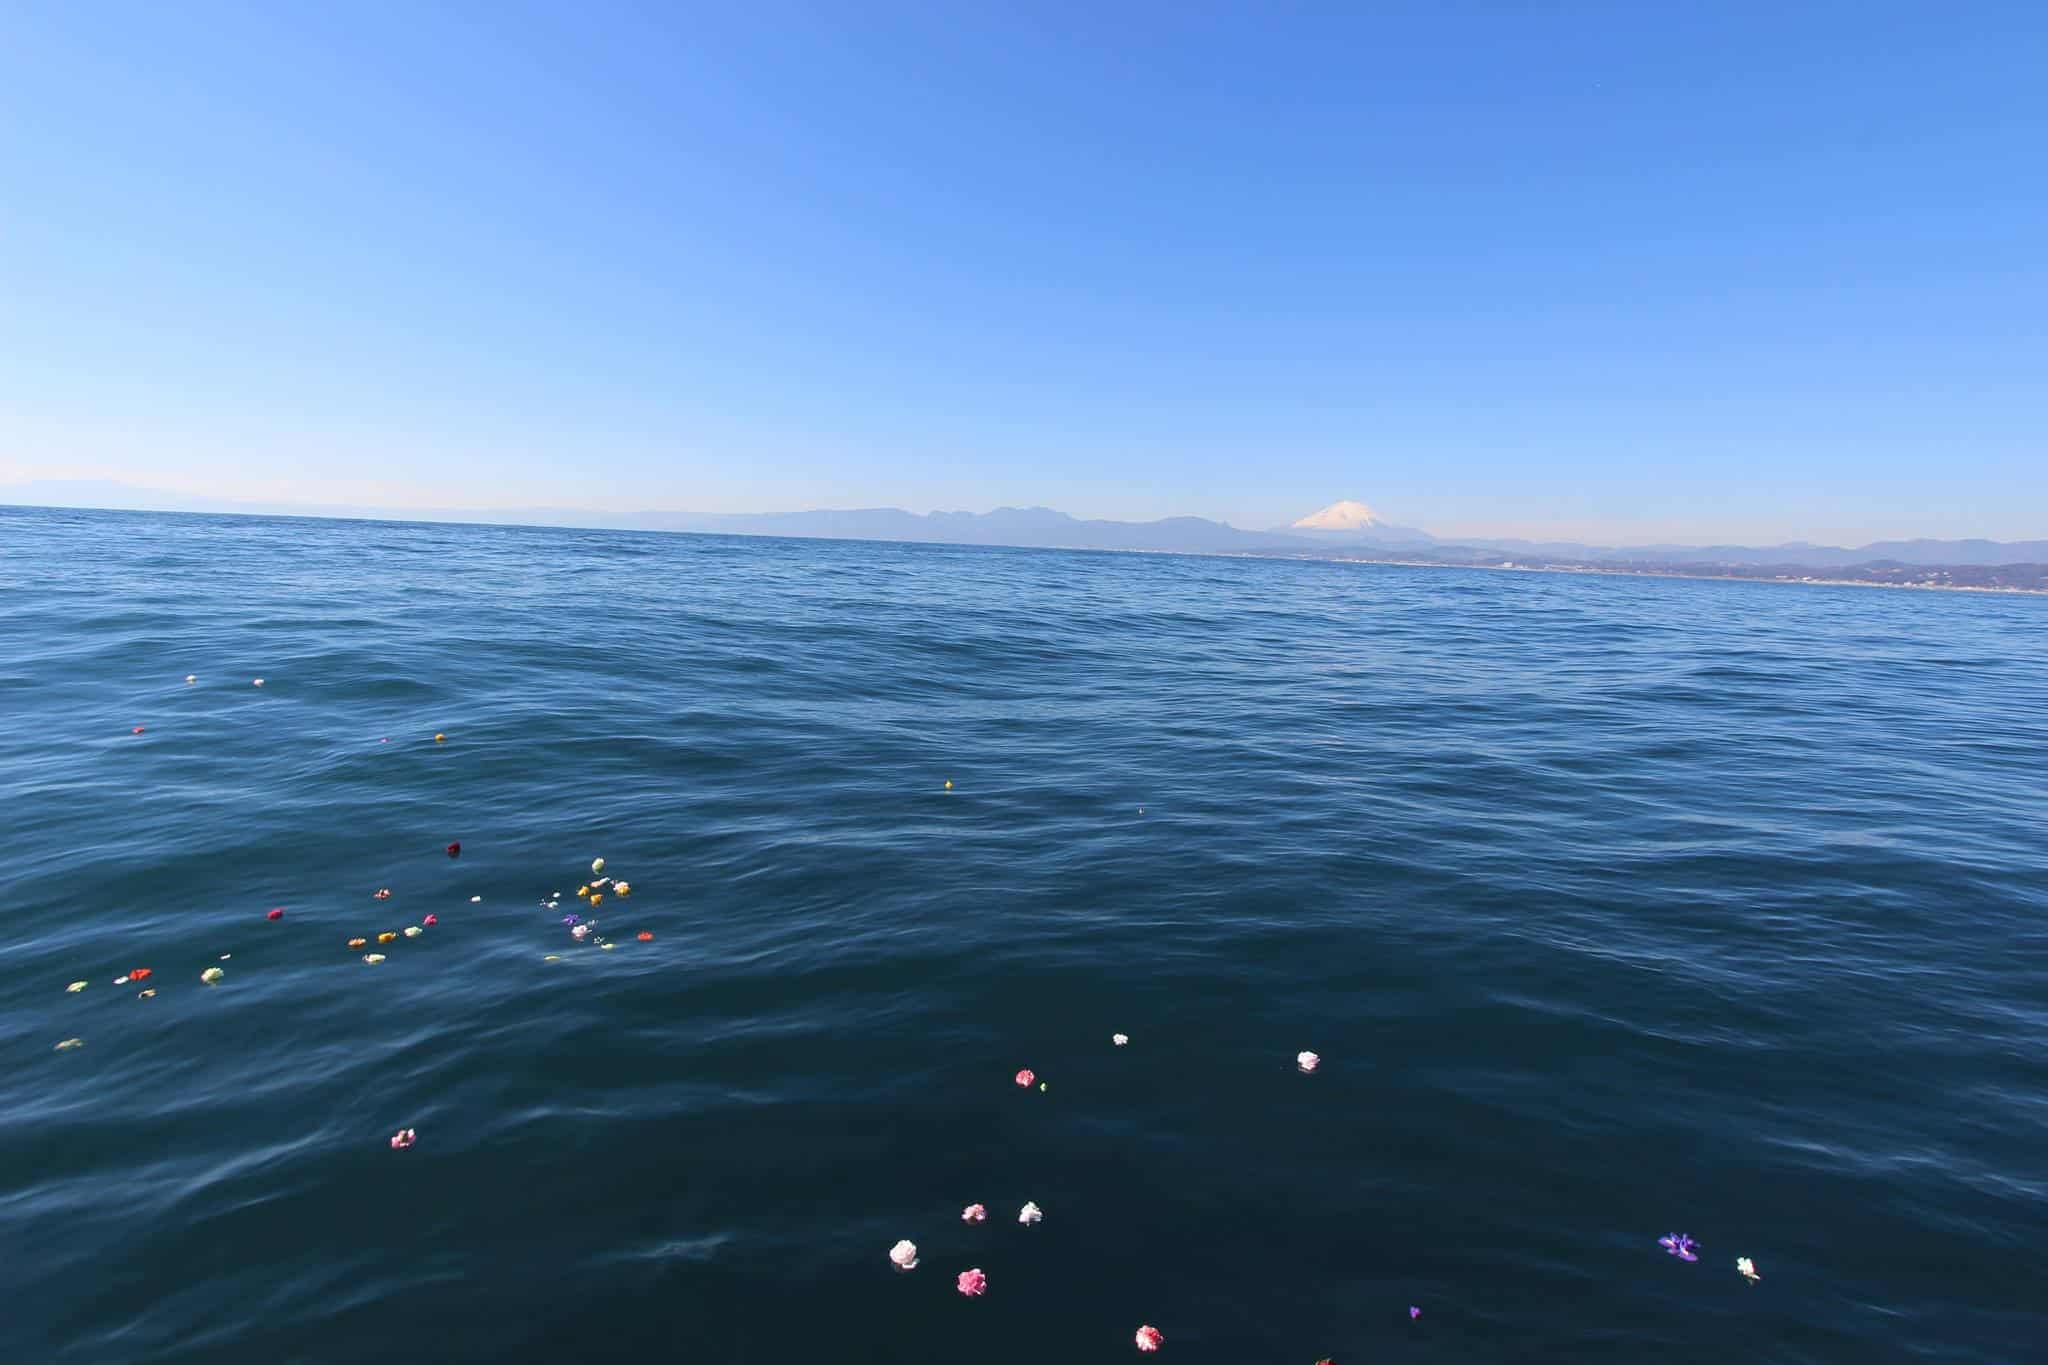 海洋散骨と富士山